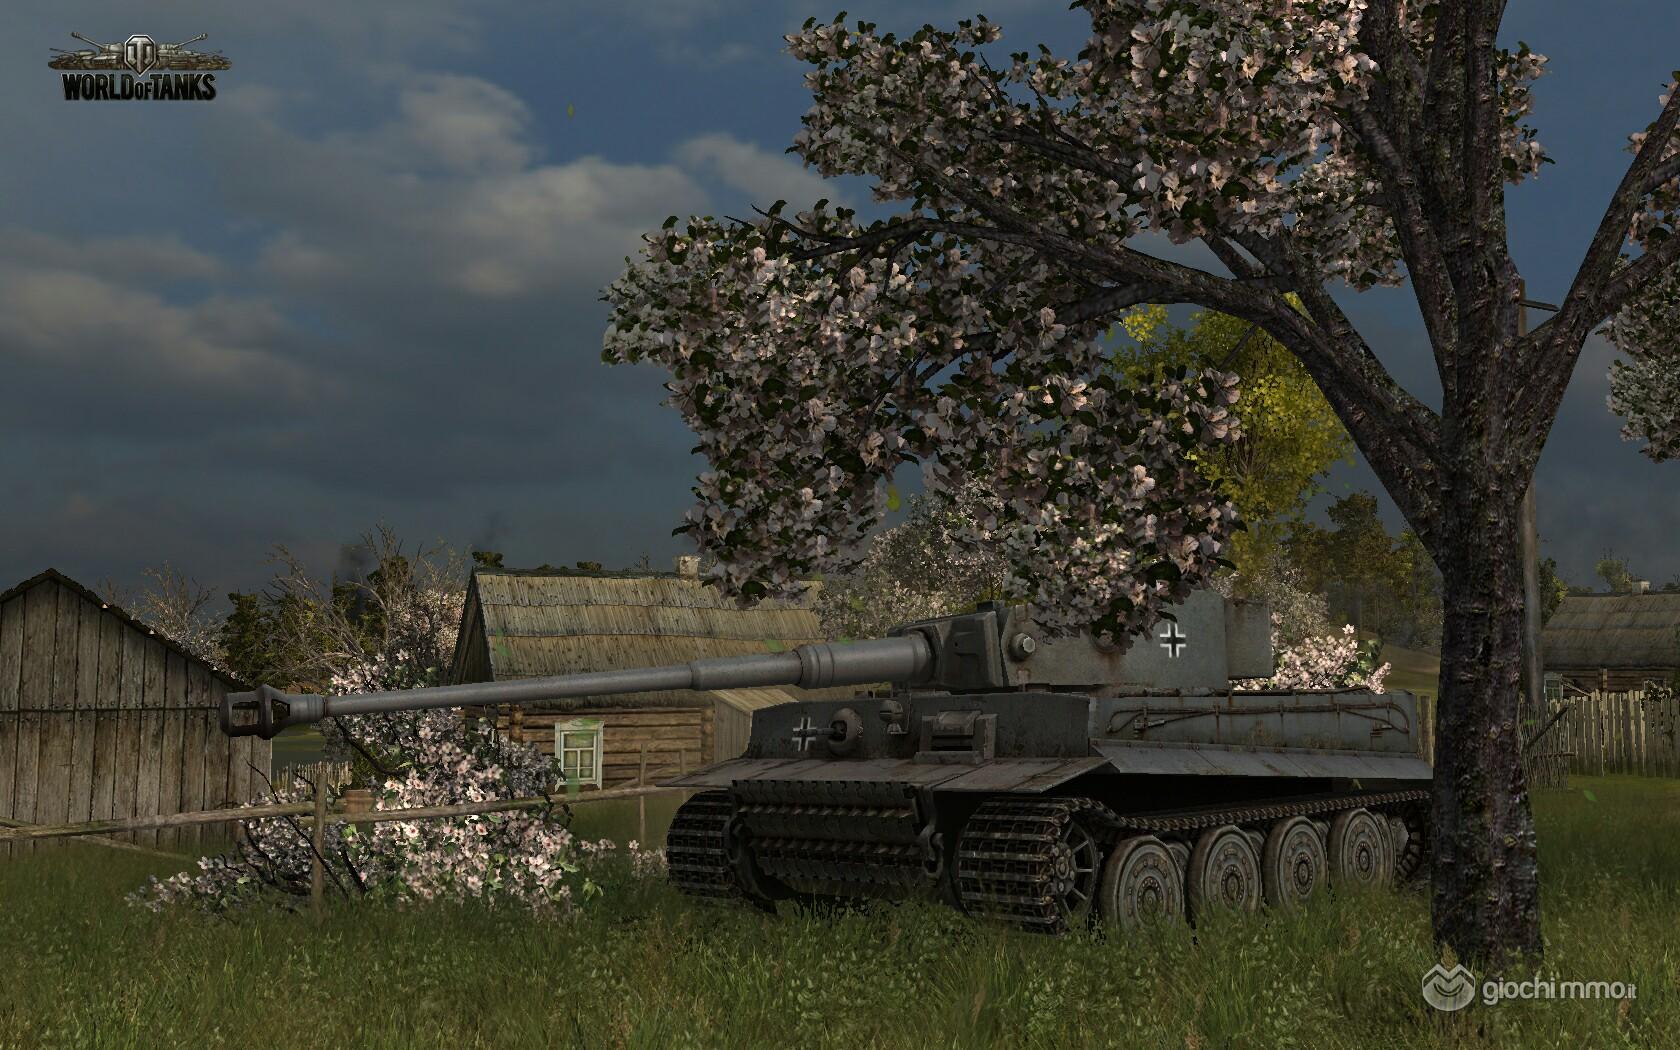 Clicca sull'immagine per ingrandirlaNome:   World of Tanks screen8.jpgVisite: 92Dimensione:   537.2 KBID: 8205